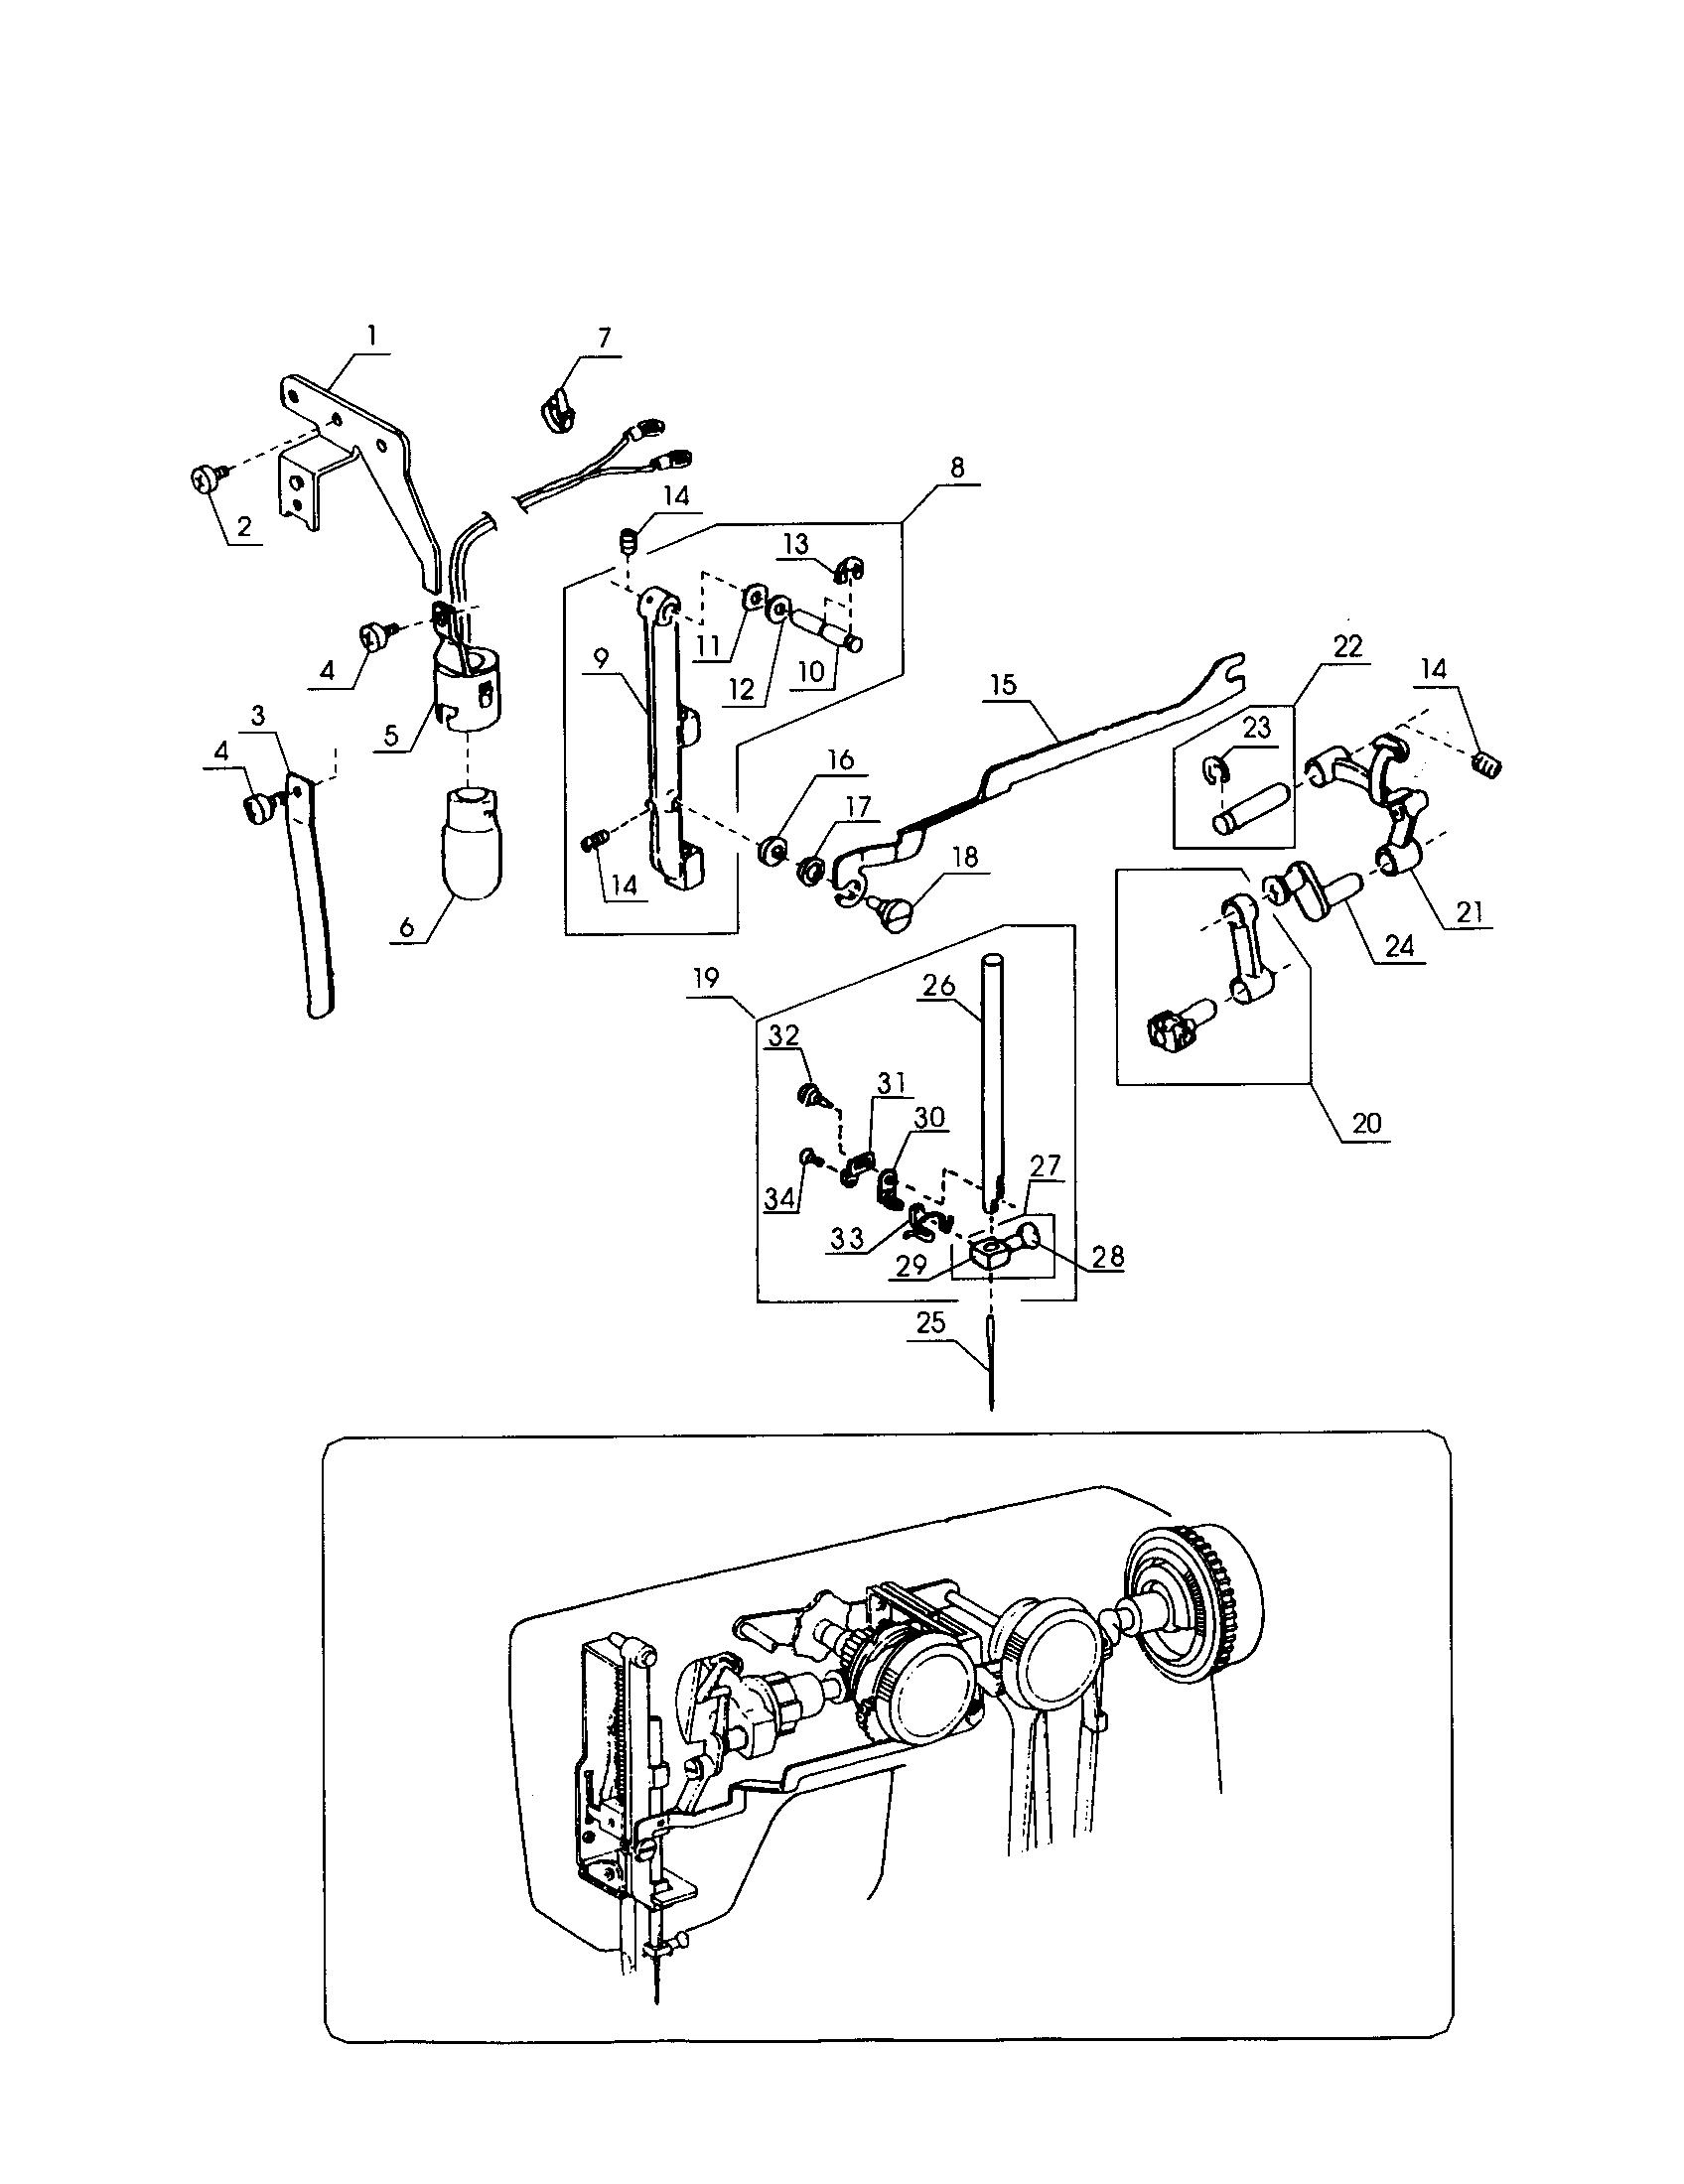 Kenmore model 38515512000 mechanical sewing machines